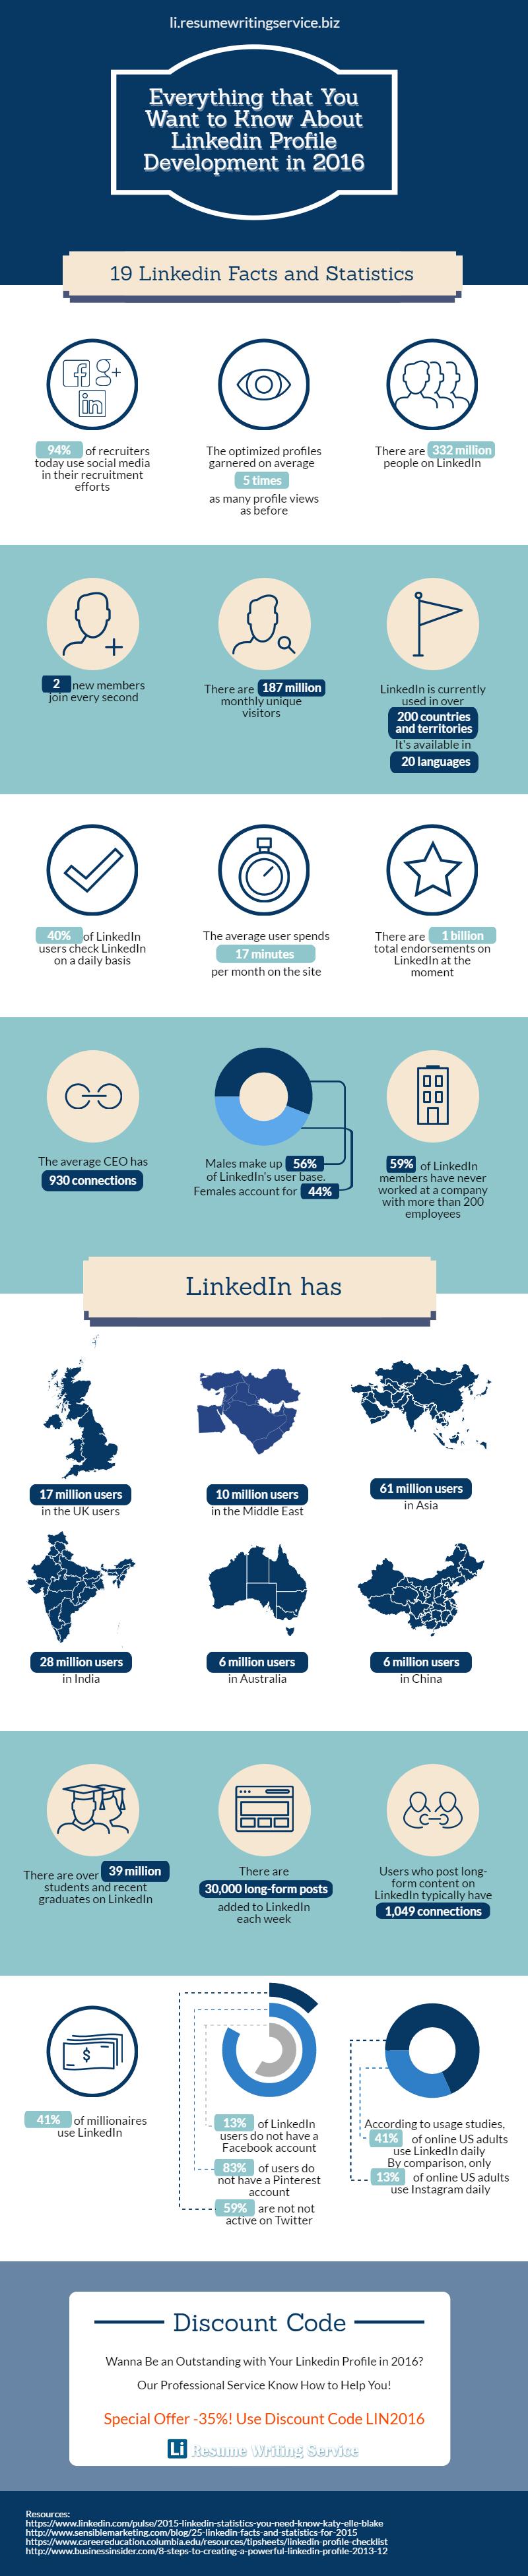 Linkedin Profile Development in 2016